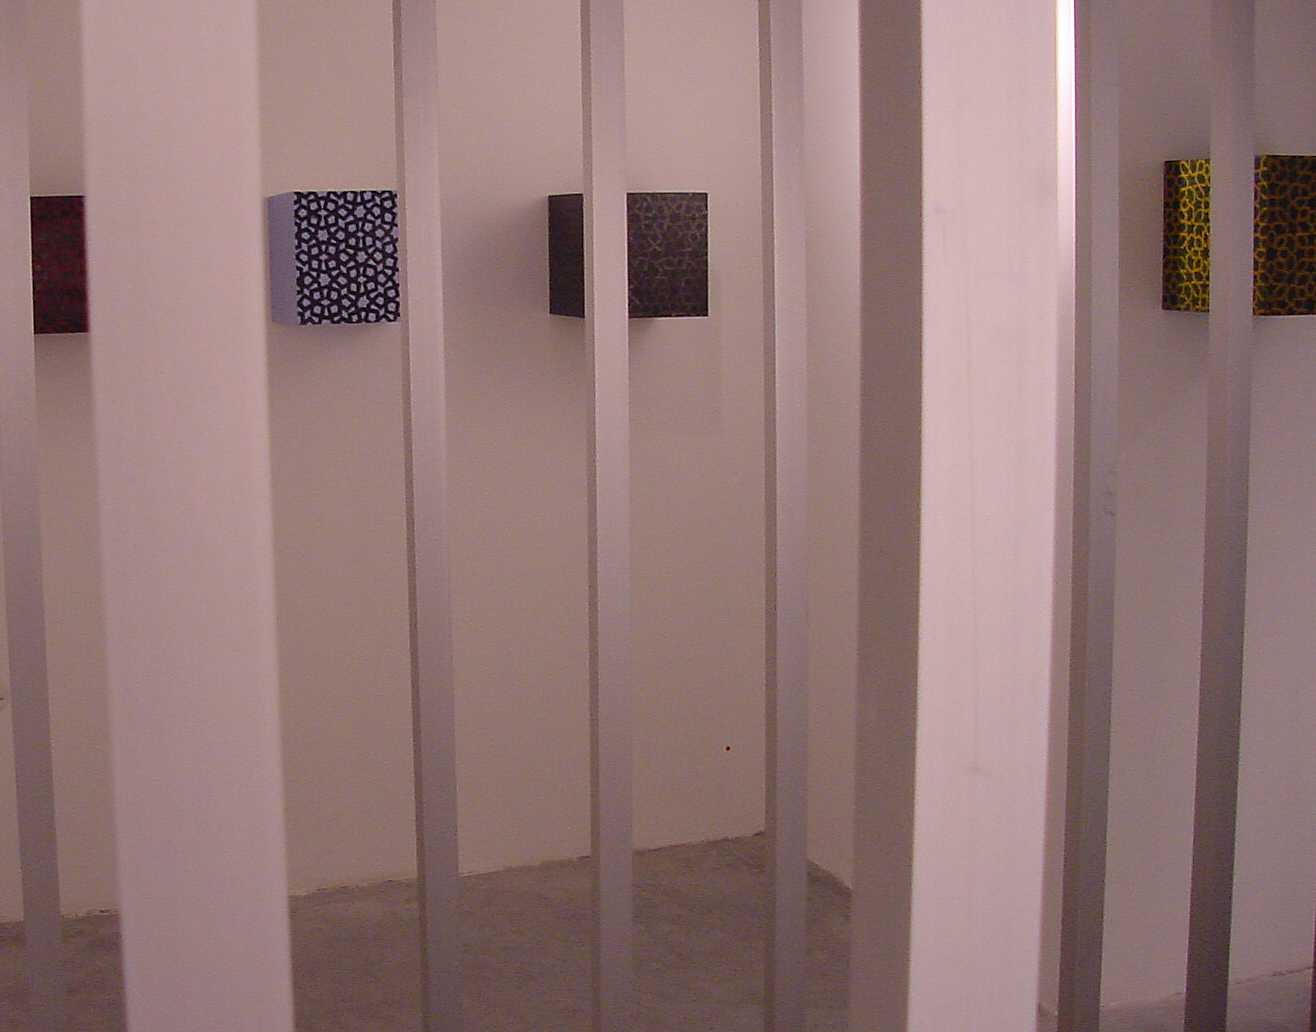 rashida 2002 box 6,insteletion  view